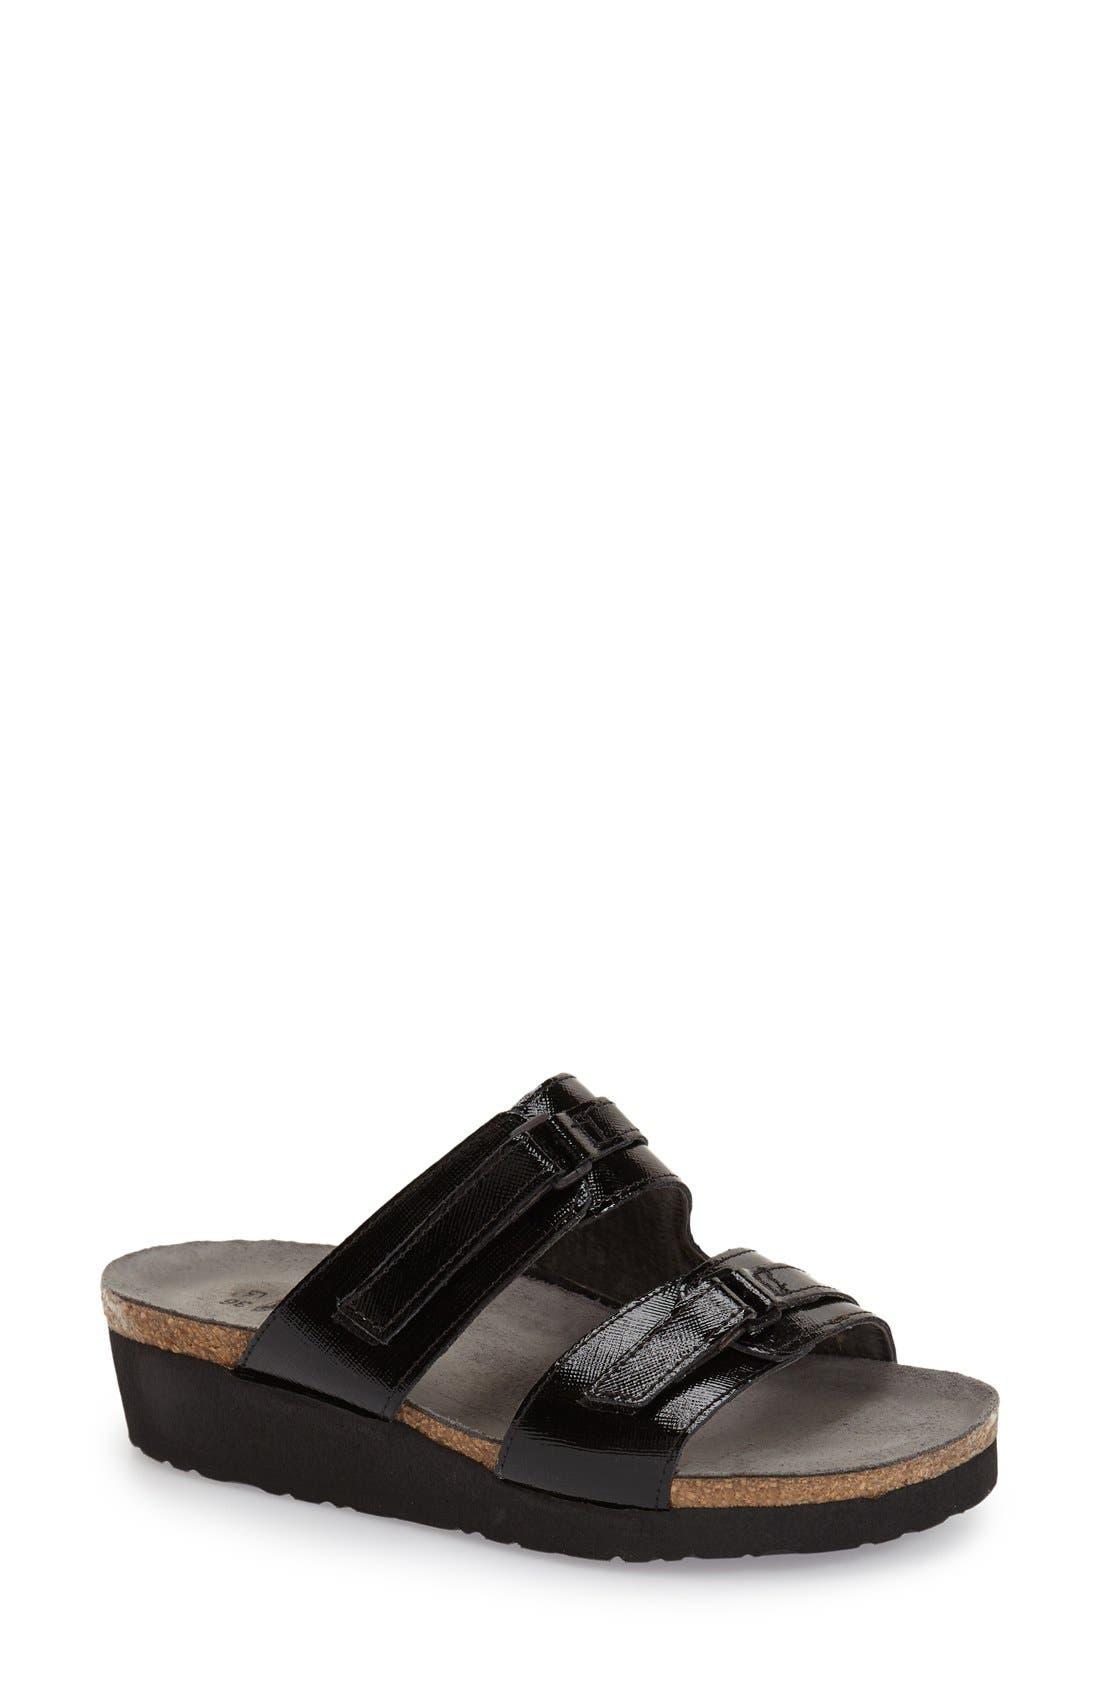 Main Image - Naot 'Carly' Slide Sandal (Women)